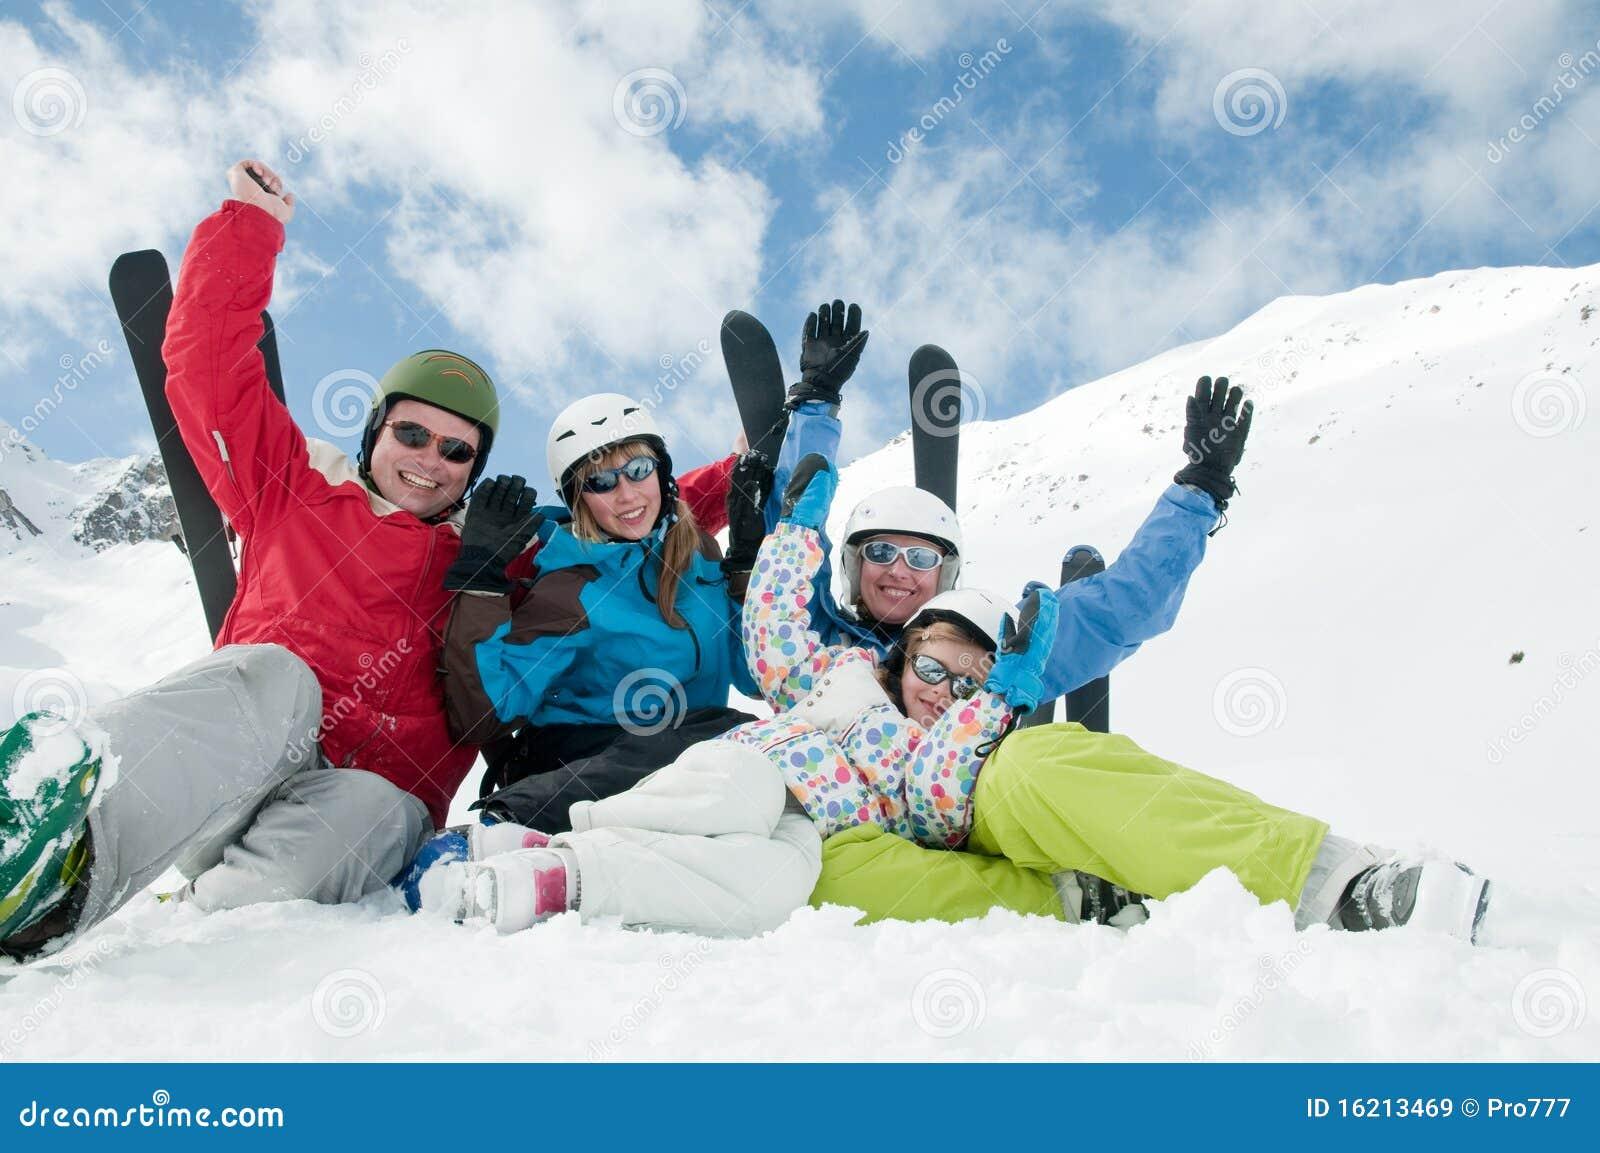 Famille, ski, neige, soleil et amusement